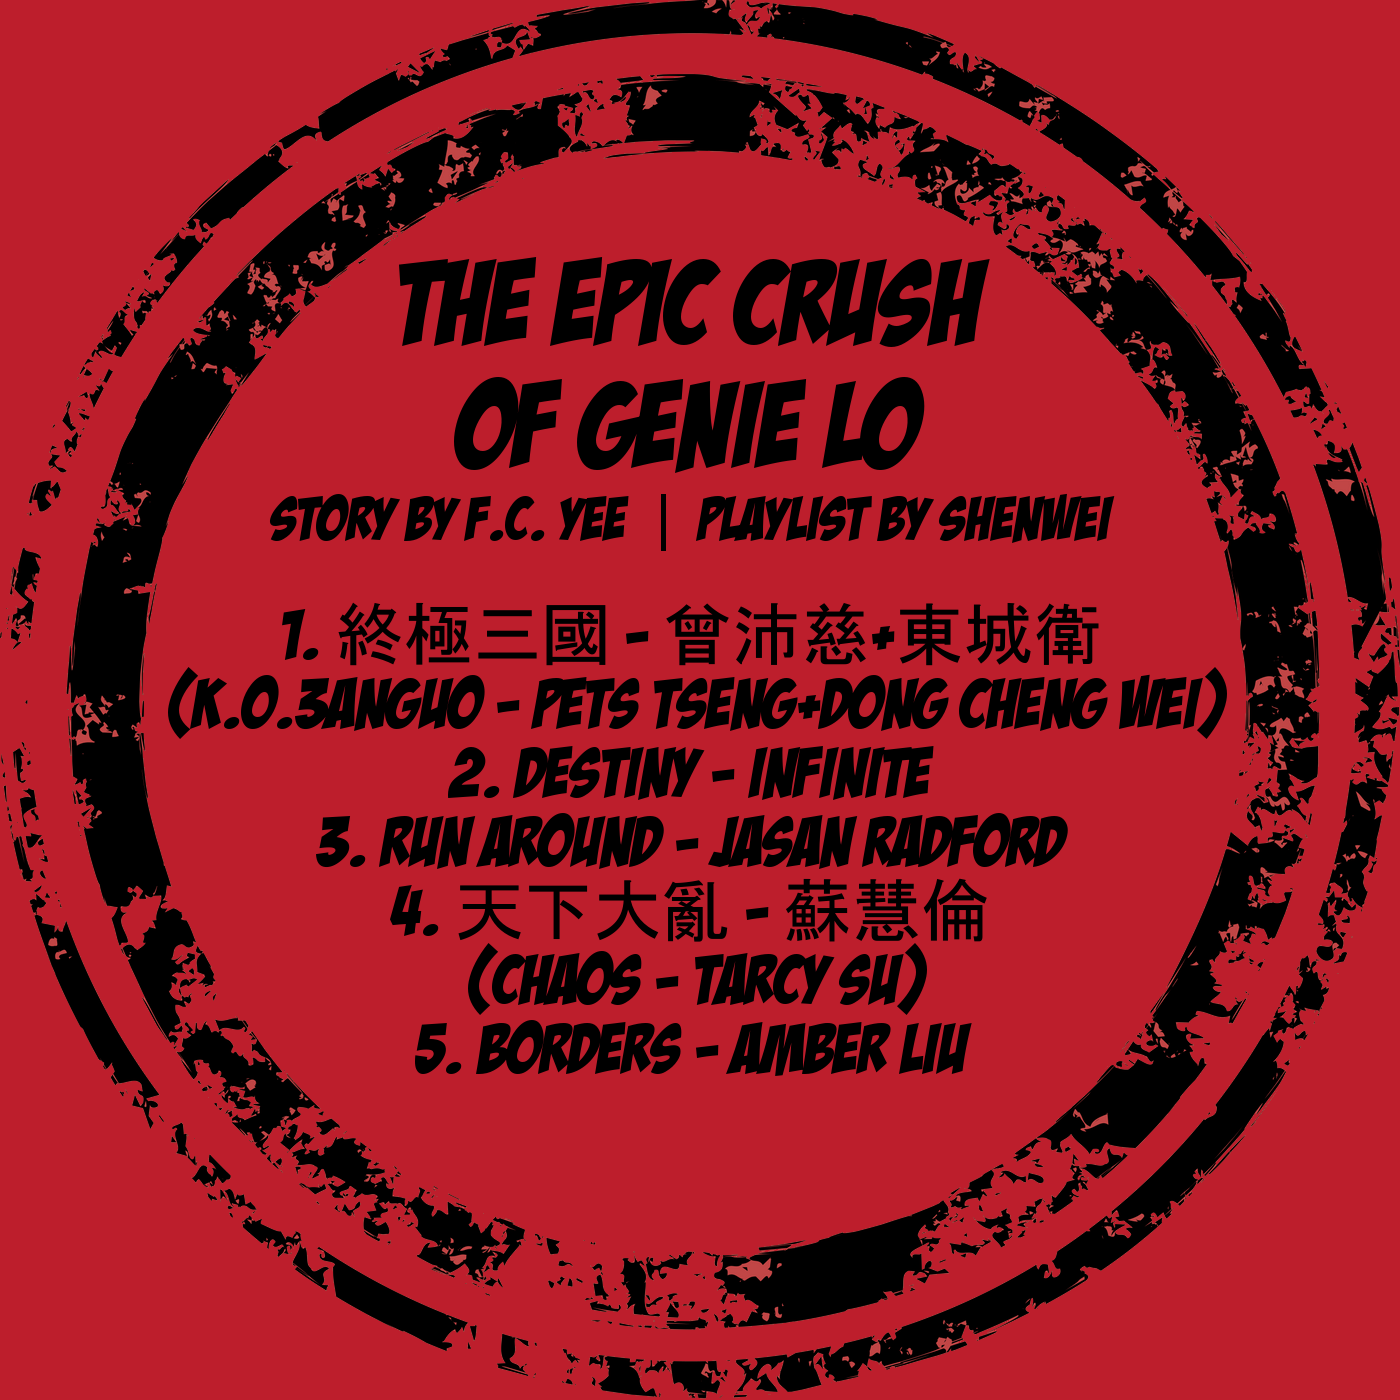 The Epic Crush of Genie Lo album tracks